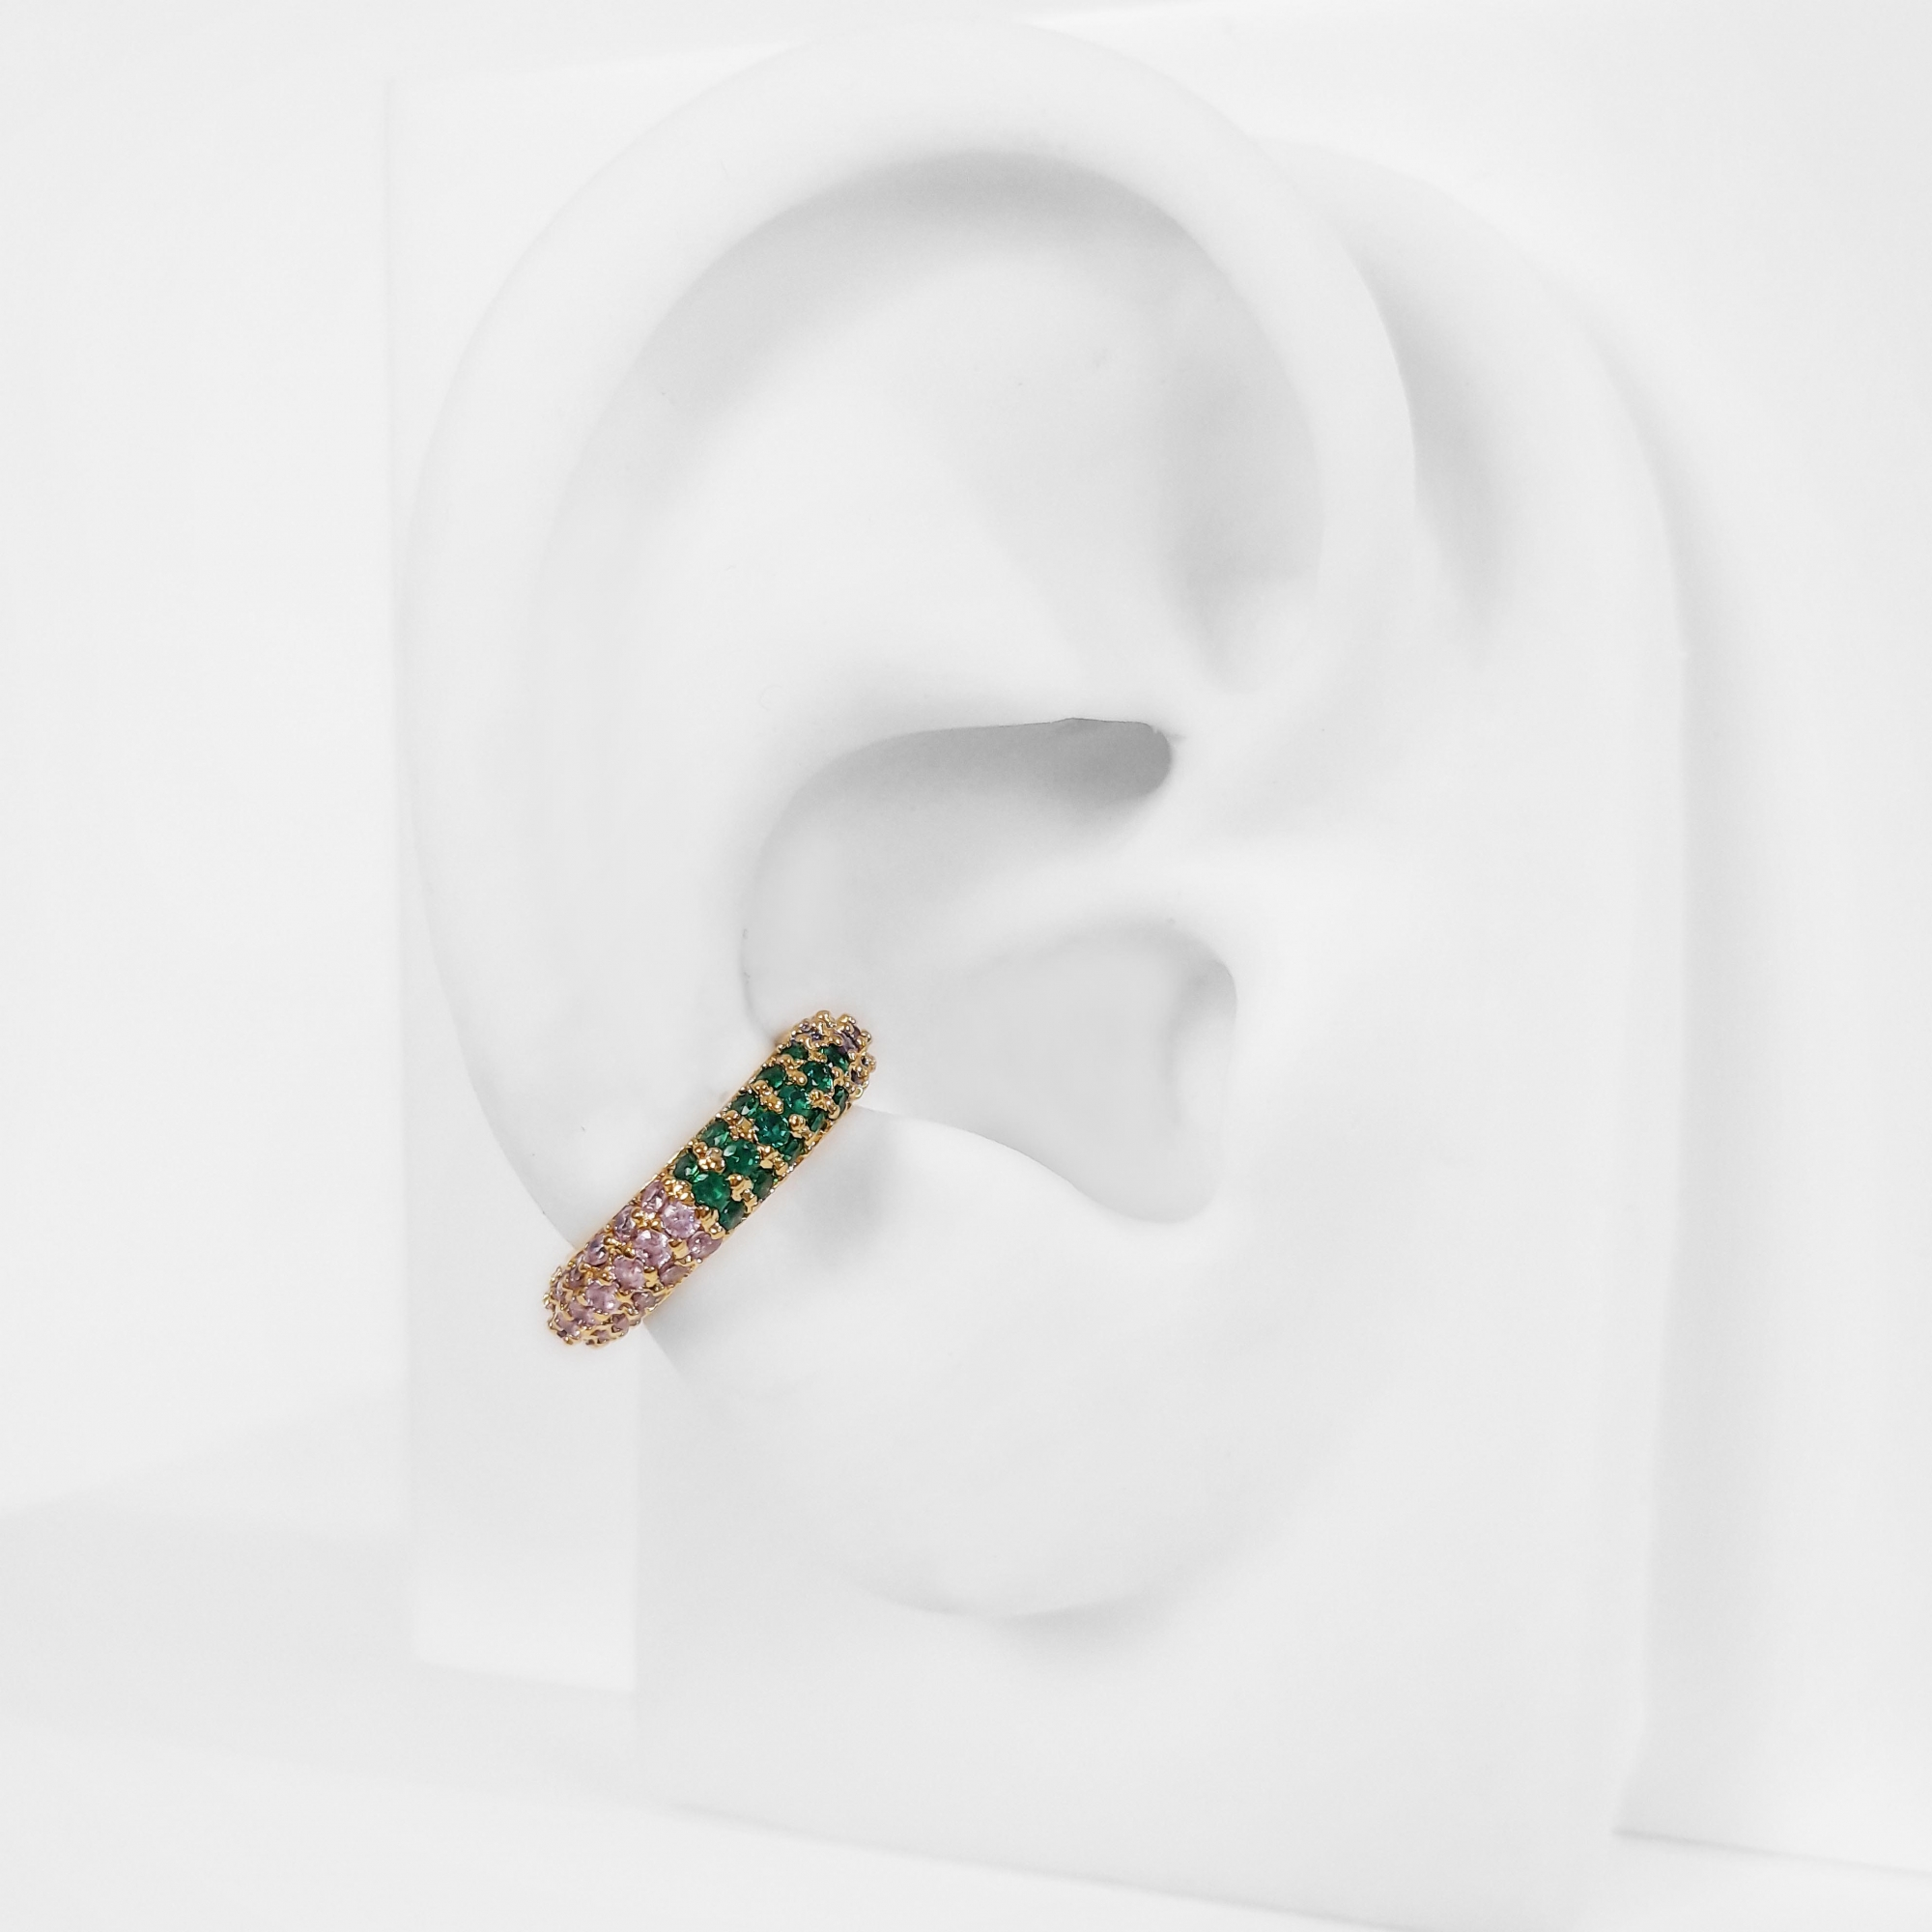 Piercing Fake Ear Hook Argola Cravejado Folheado a Ouro 18k  - Lunozê Joias